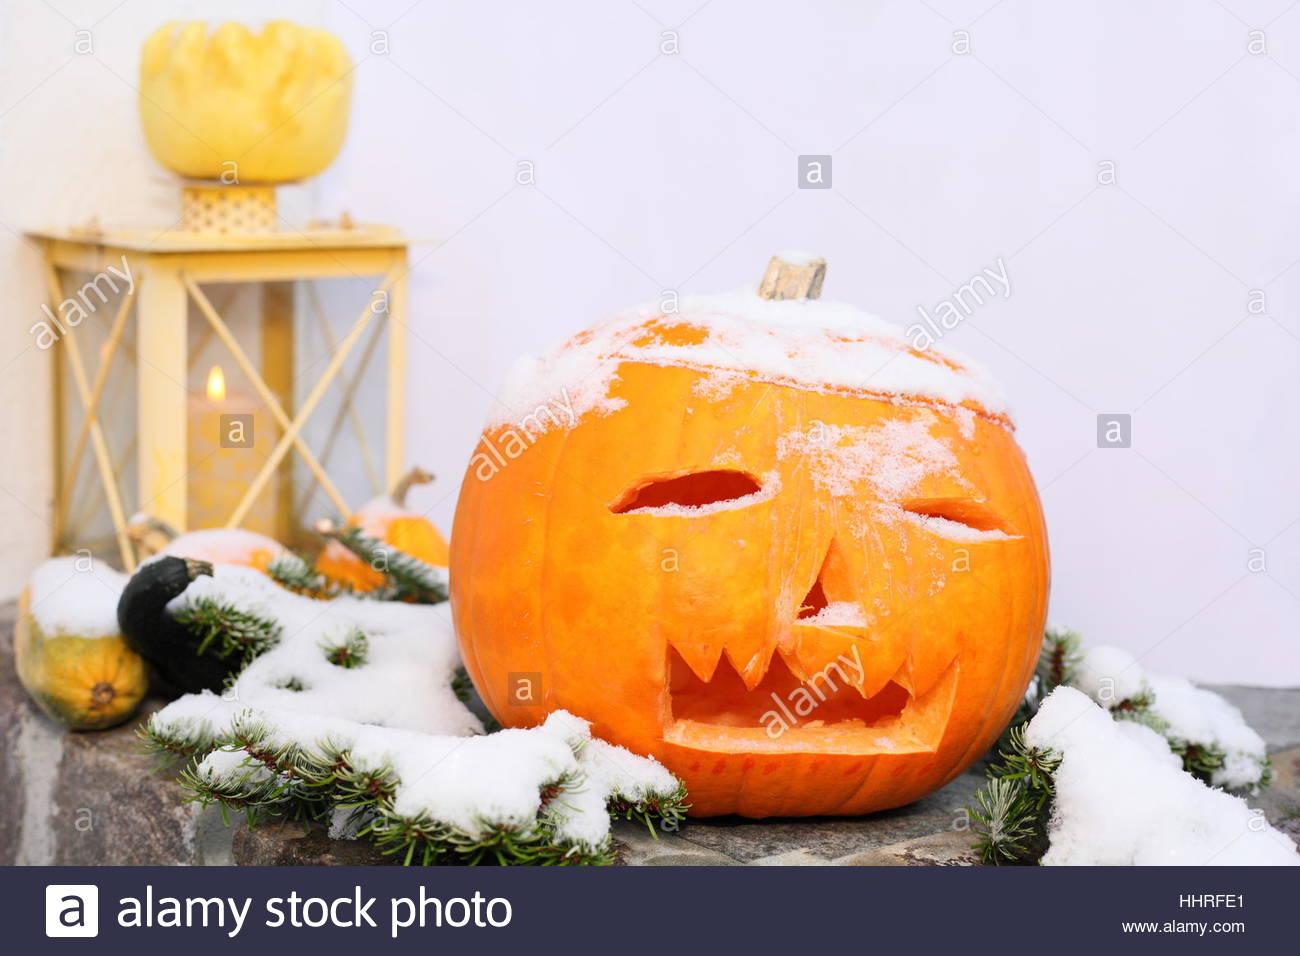 halloween pumpkin enthusiasm amusement enjoyment joy gag joke pleasure HHRFE1